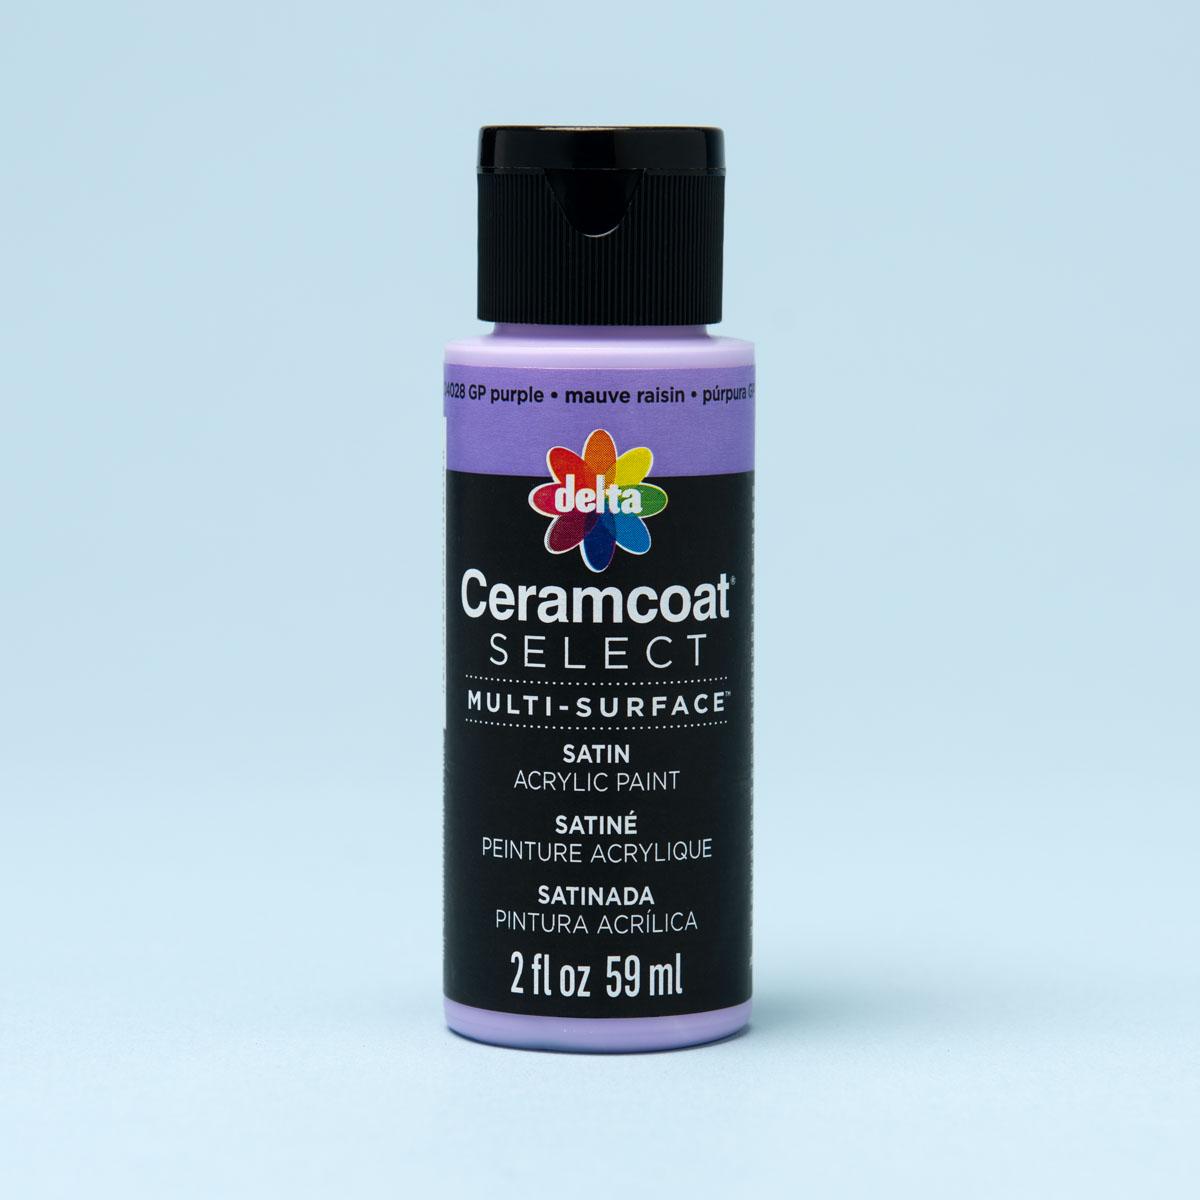 Delta Ceramcoat ® Select Multi-Surface Paint Set, 18 Colors - PROMOCMC4